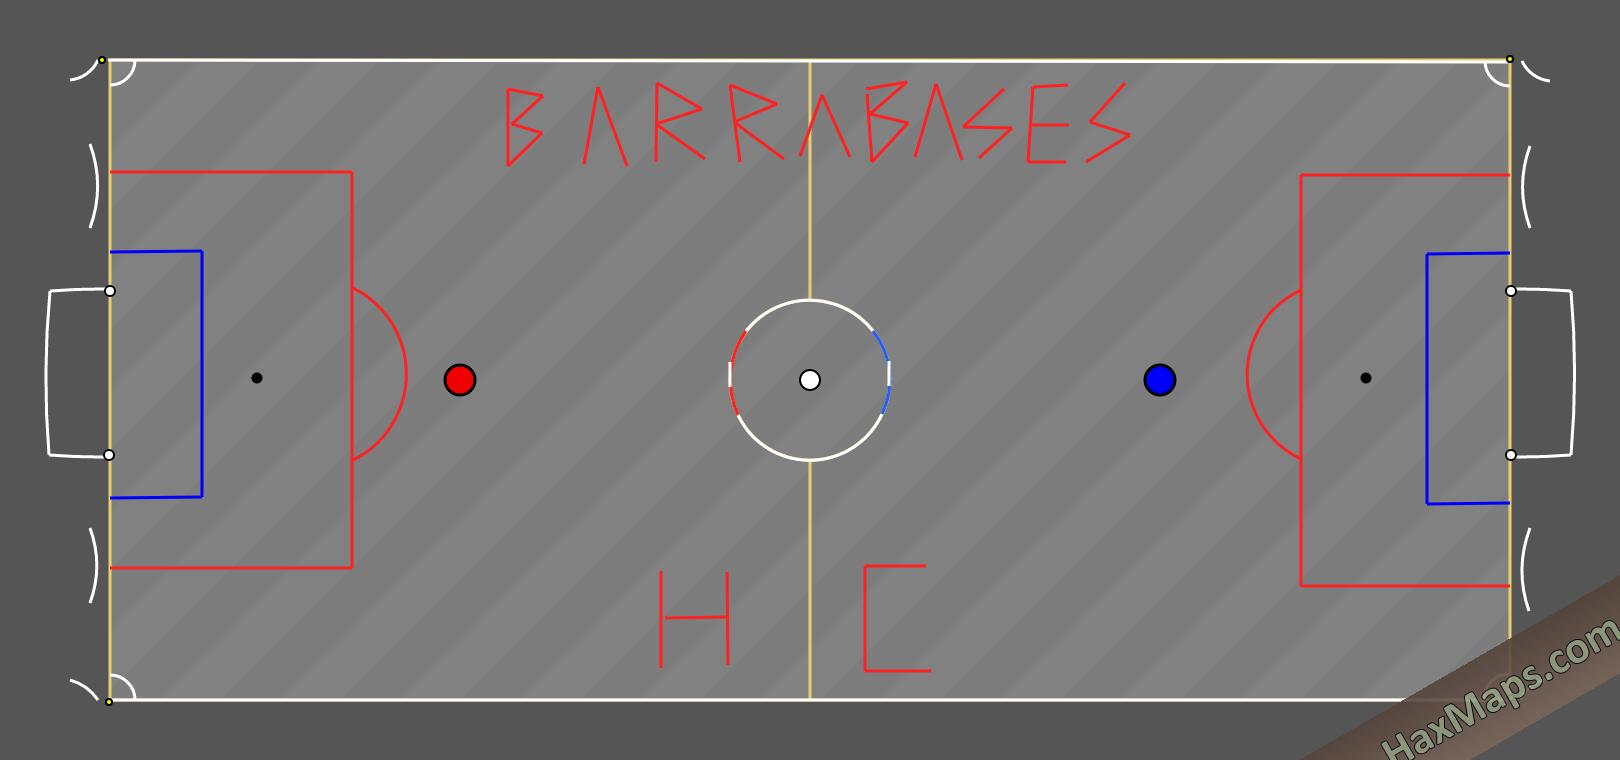 hax ball maps | Estadio Villa Feliz Barrabases HC